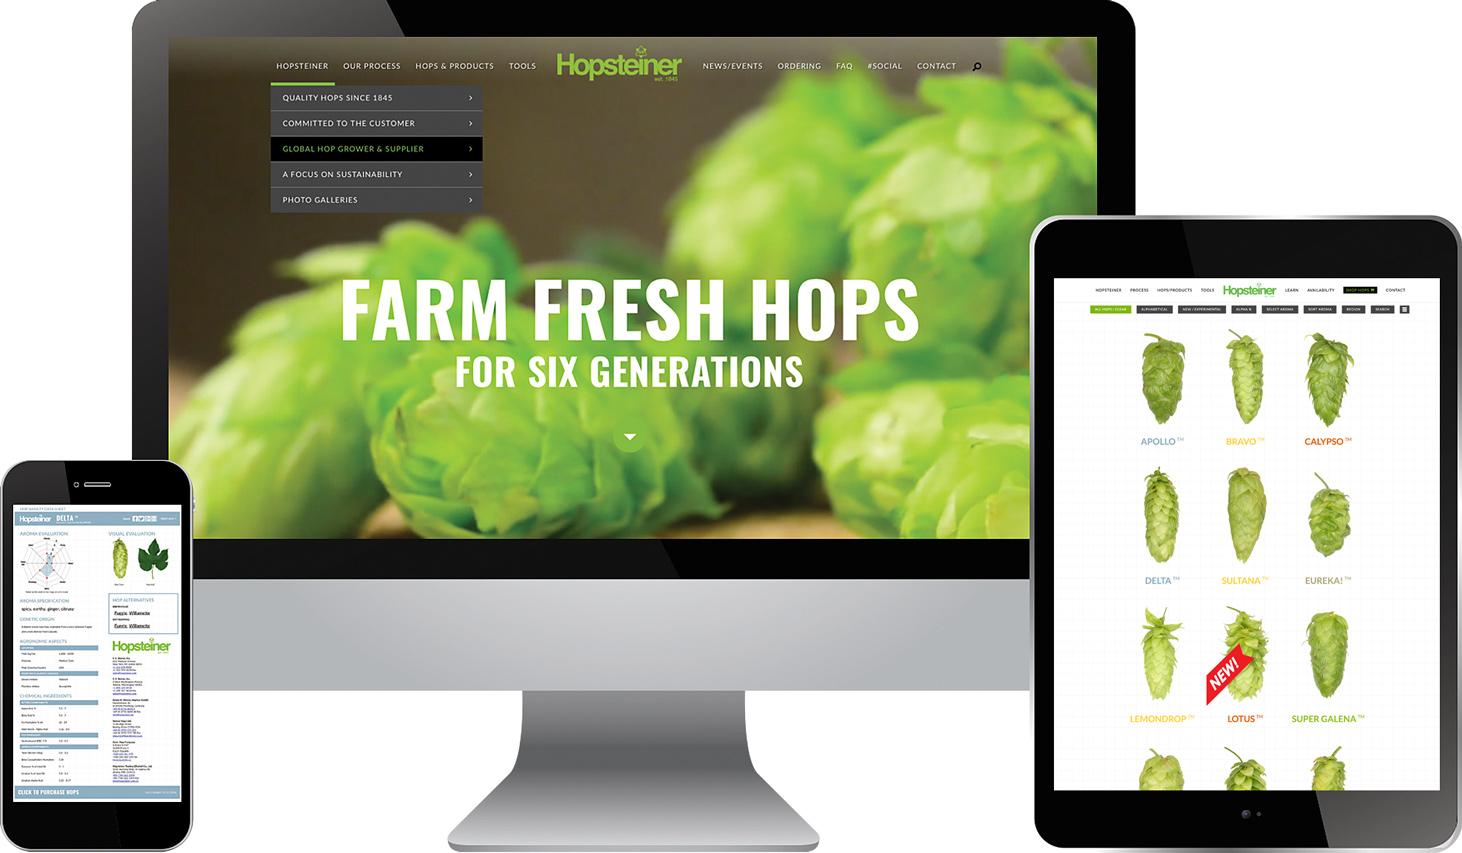 Hopsteiner Website